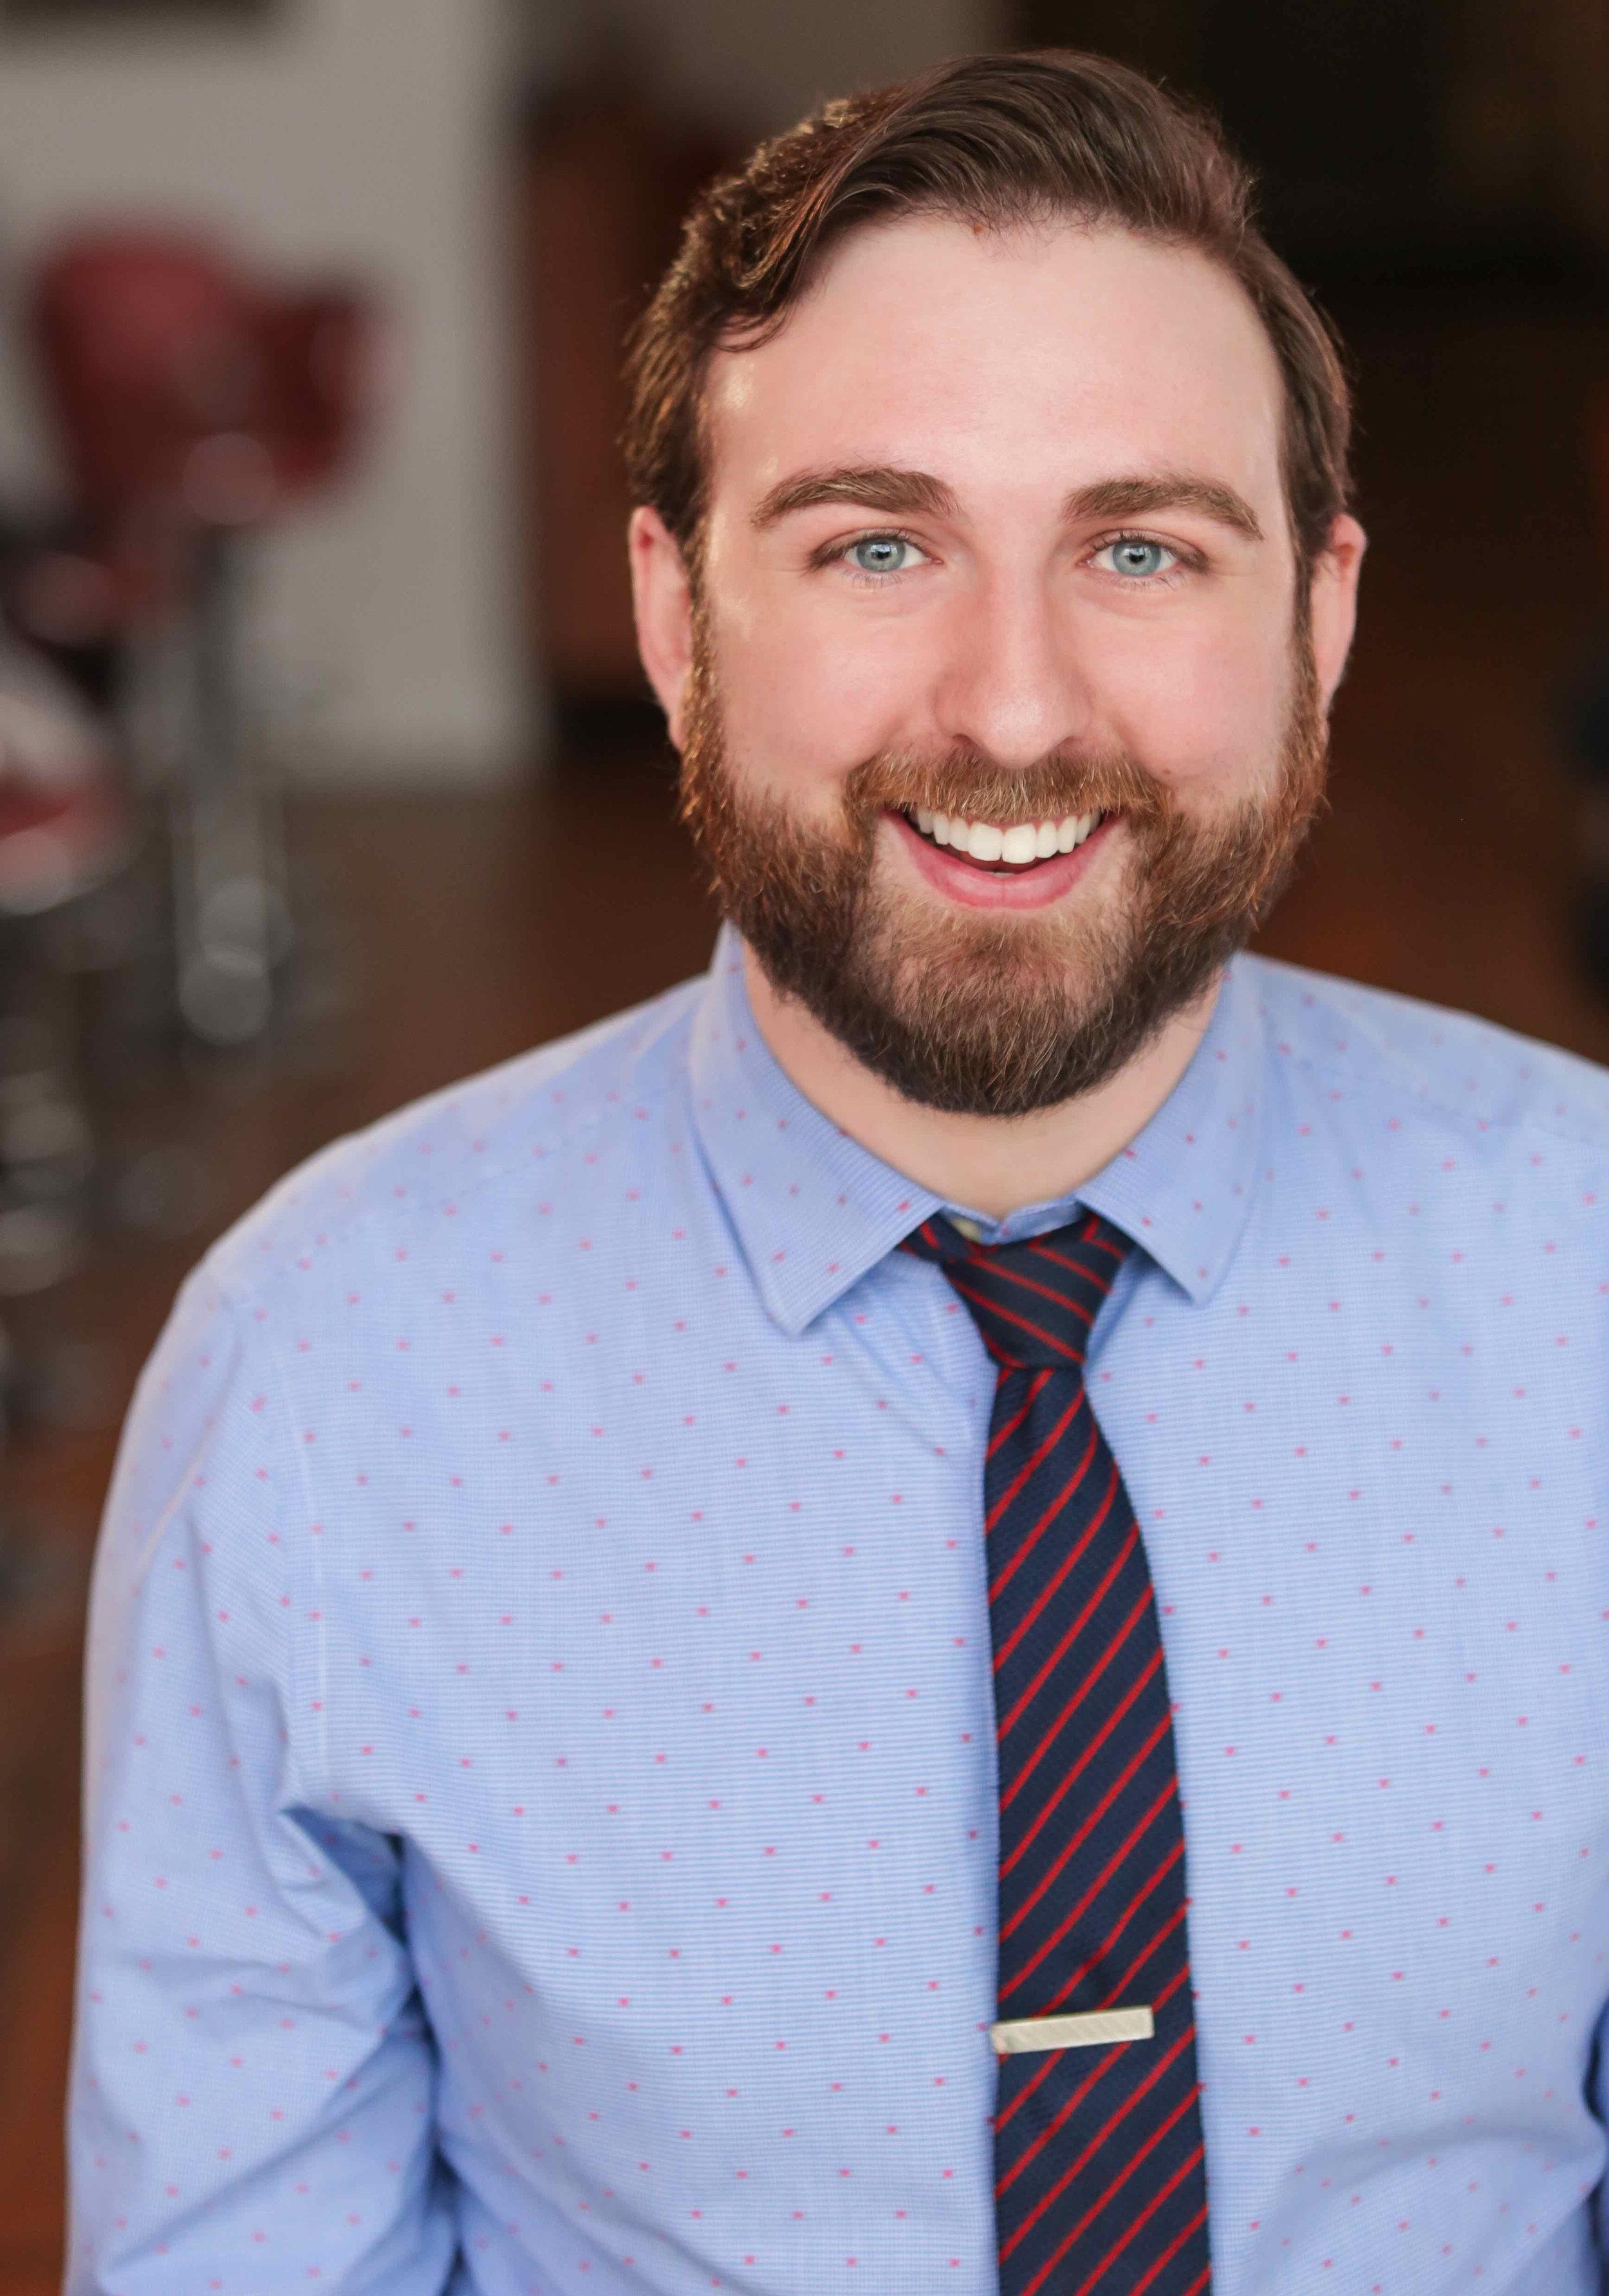 Dave Lyzenga